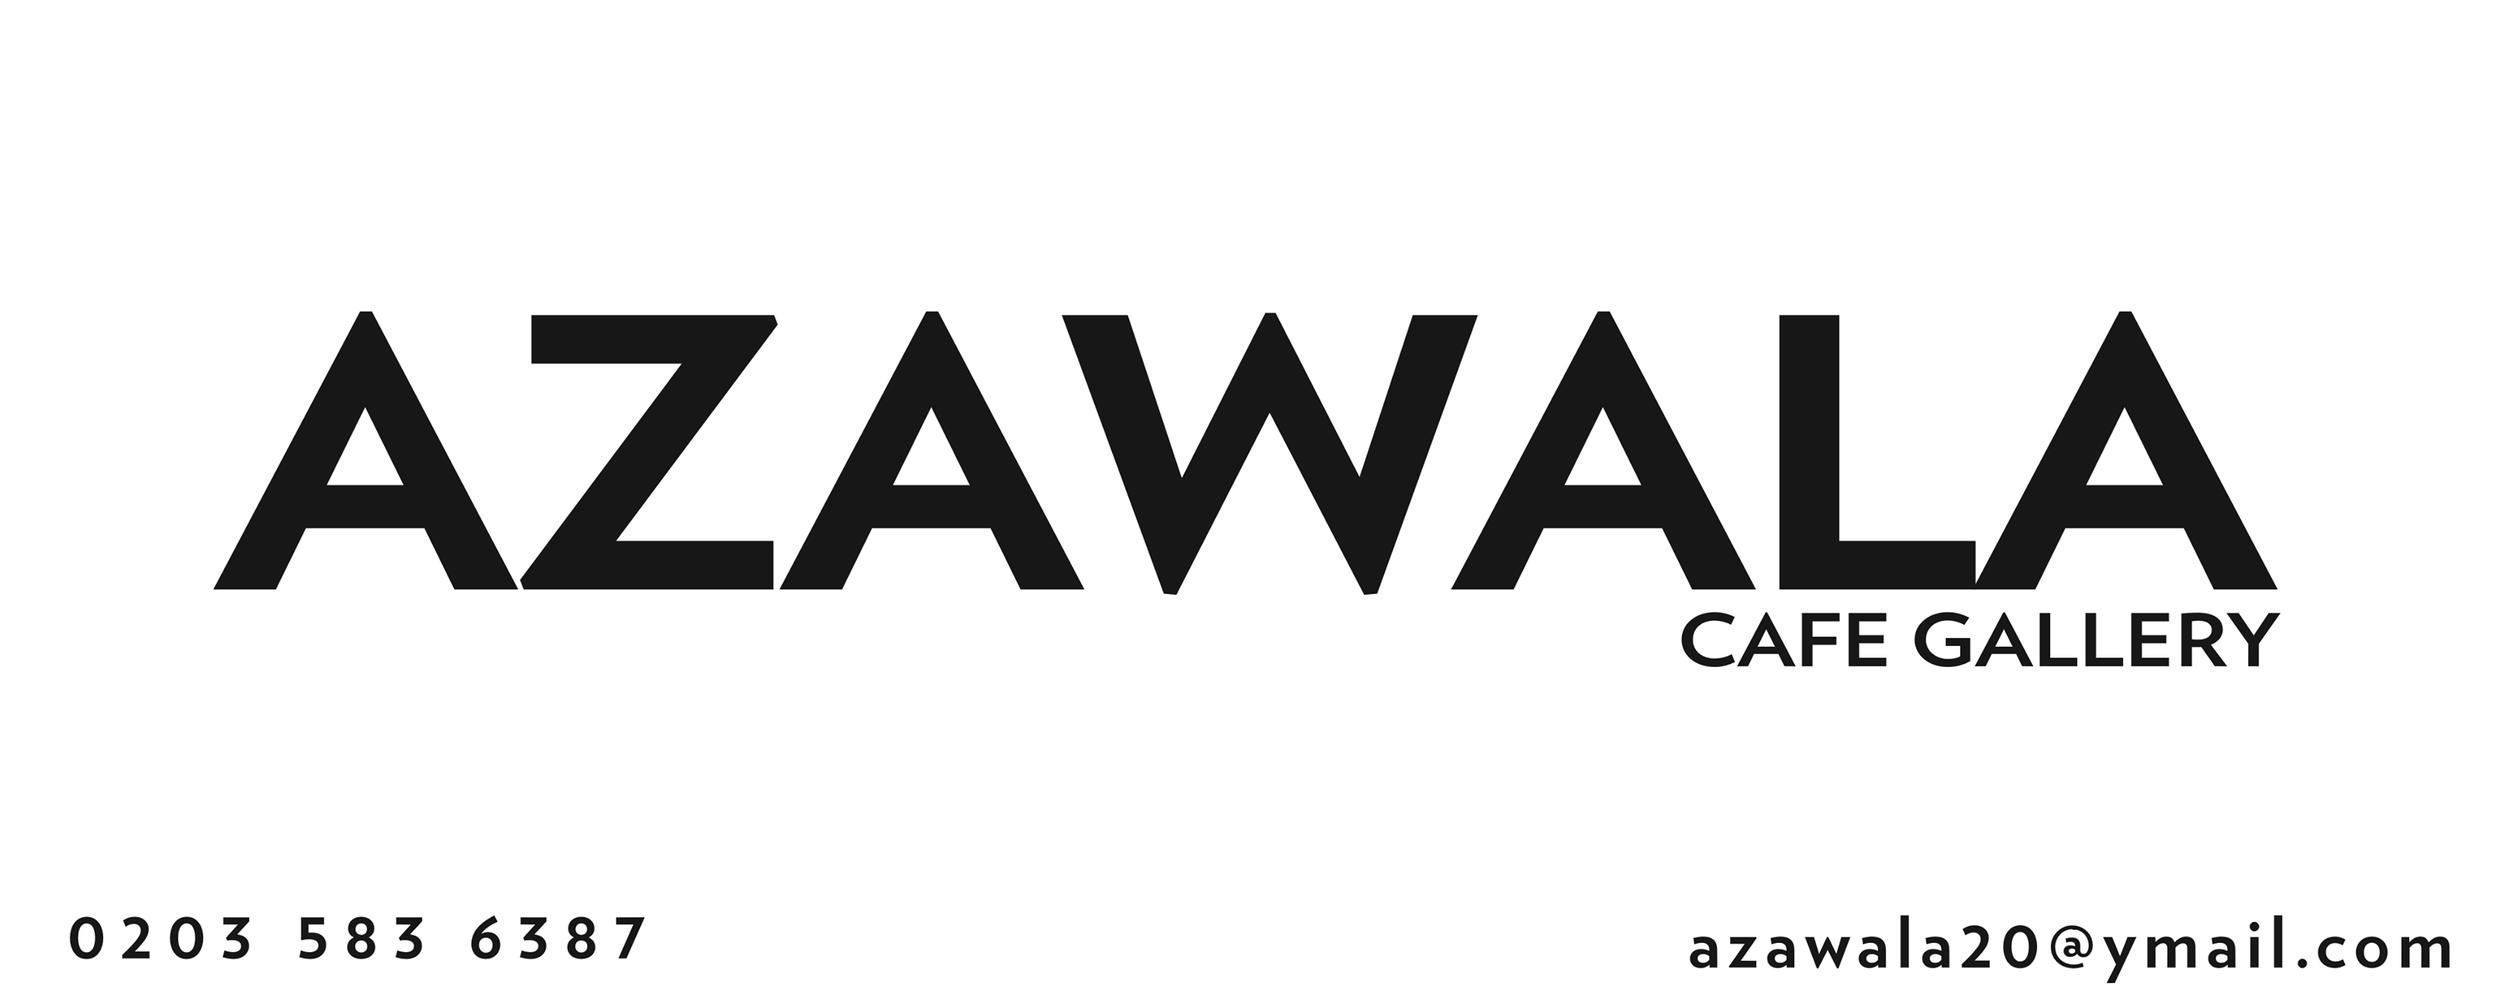 Azawala logo.png